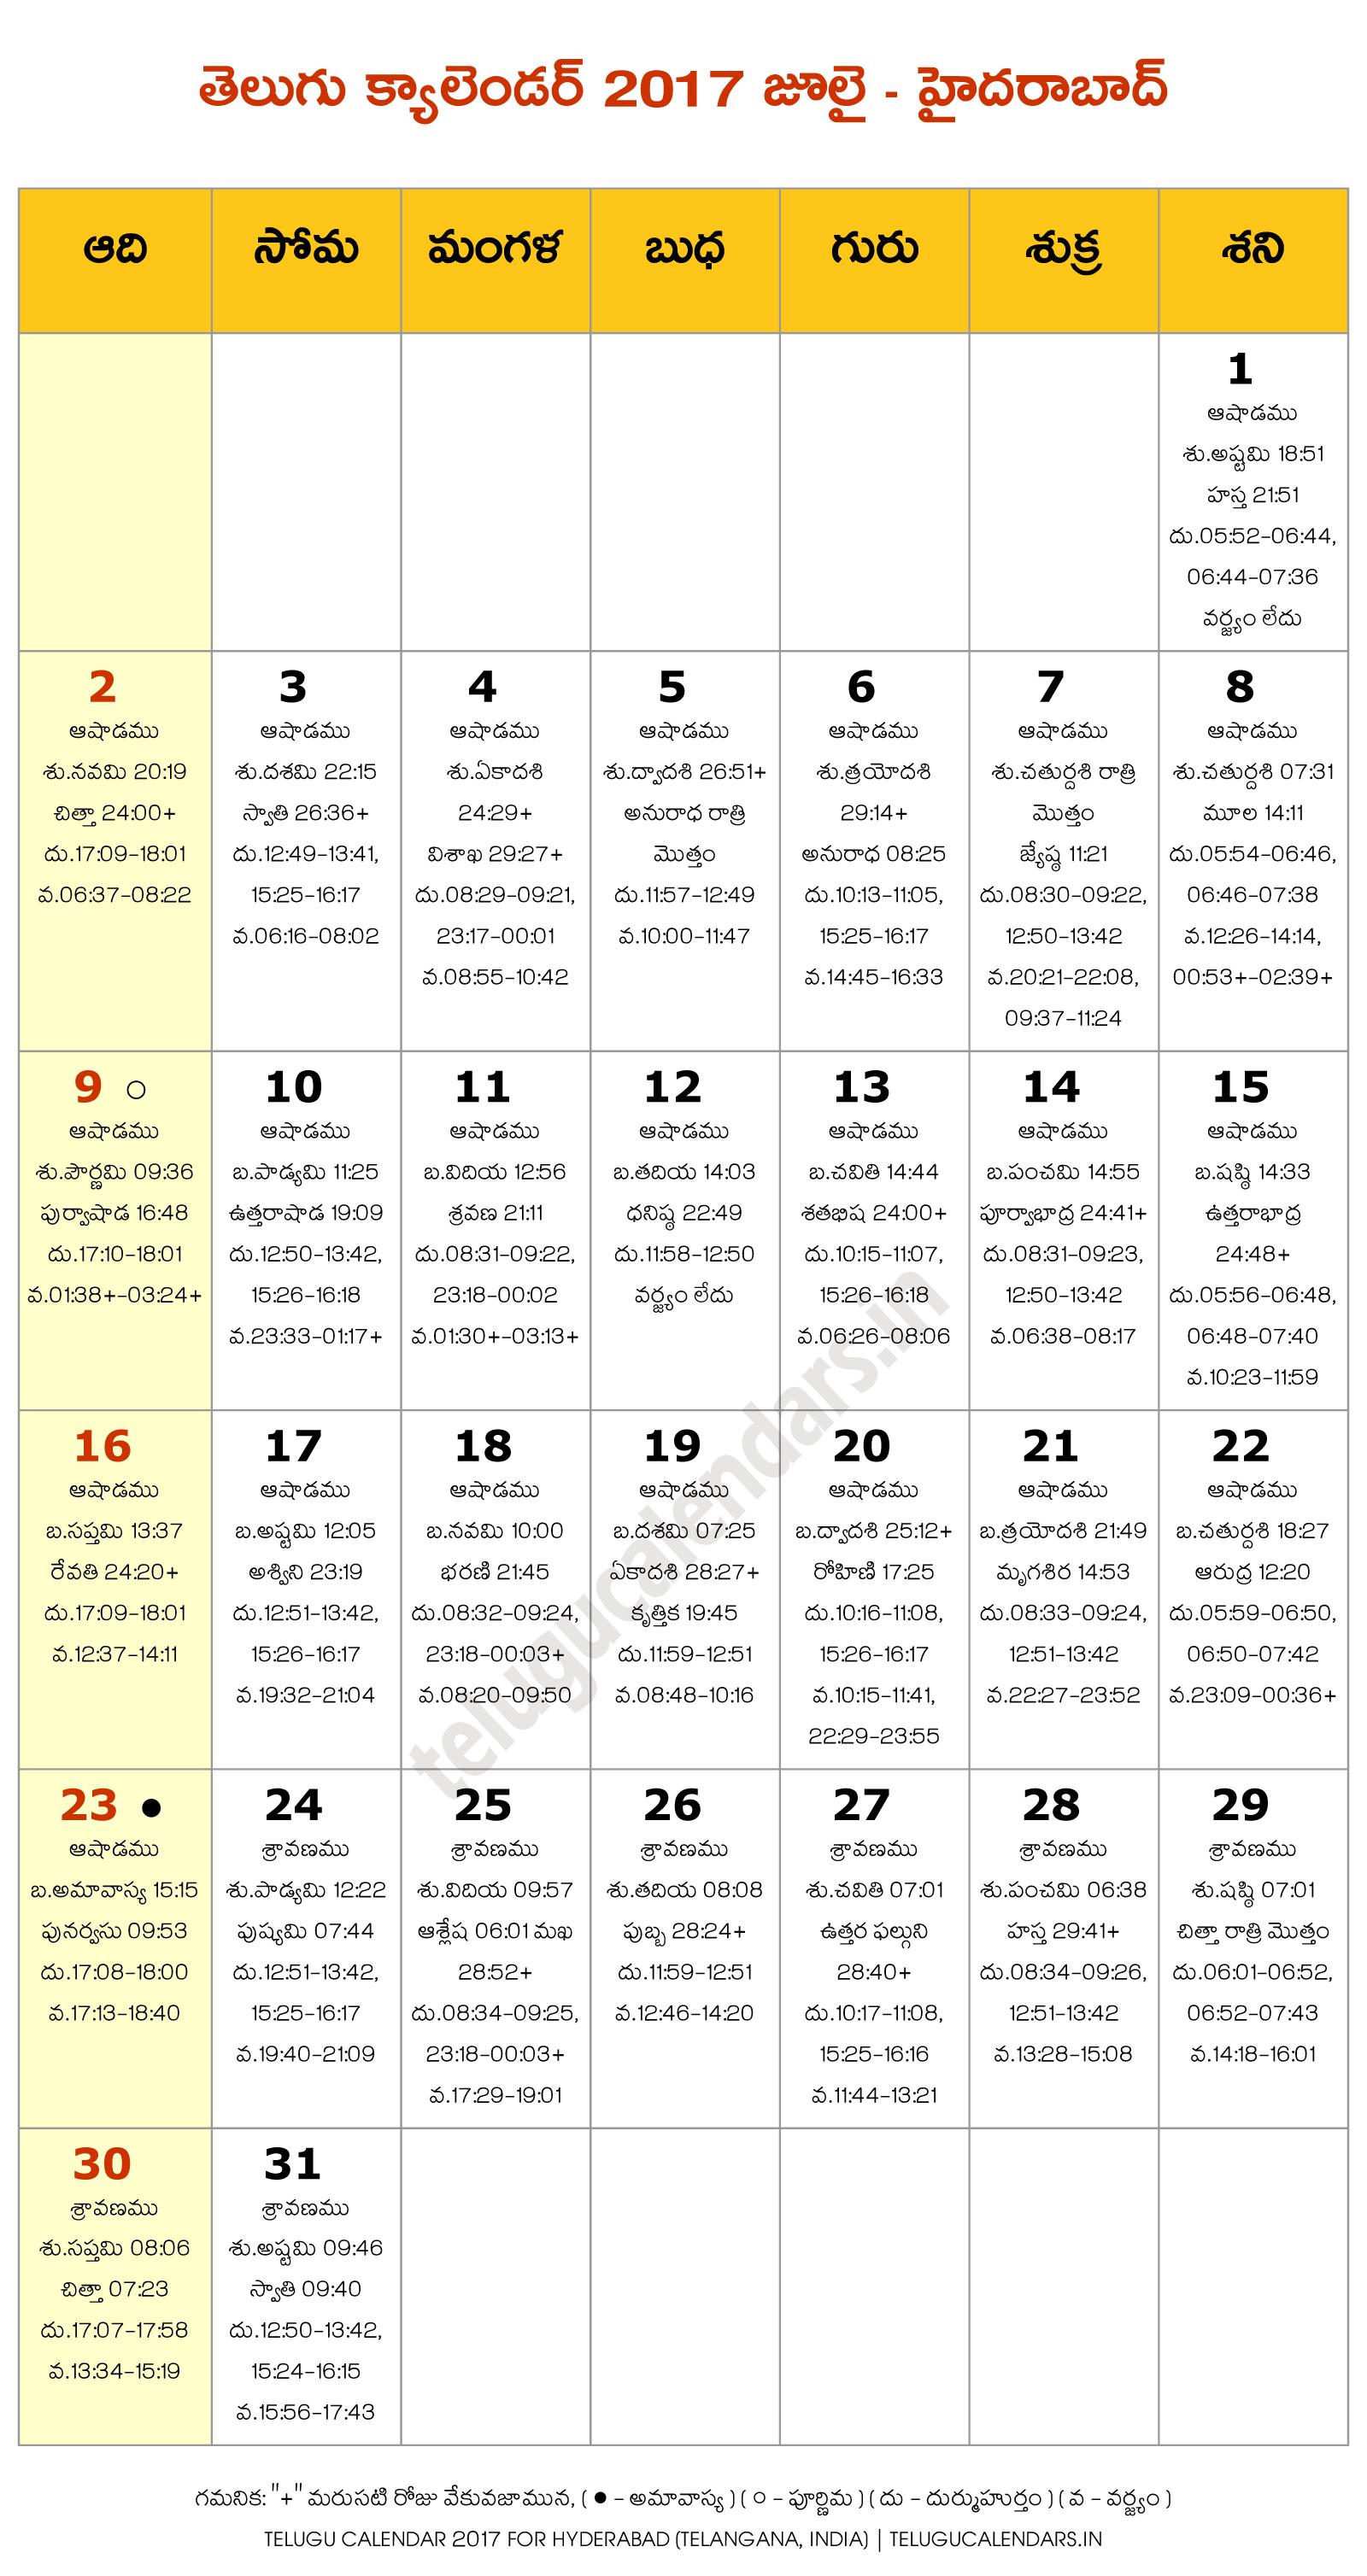 Hyderabad 2017 July Telugu Calendar | Telugu Calendars